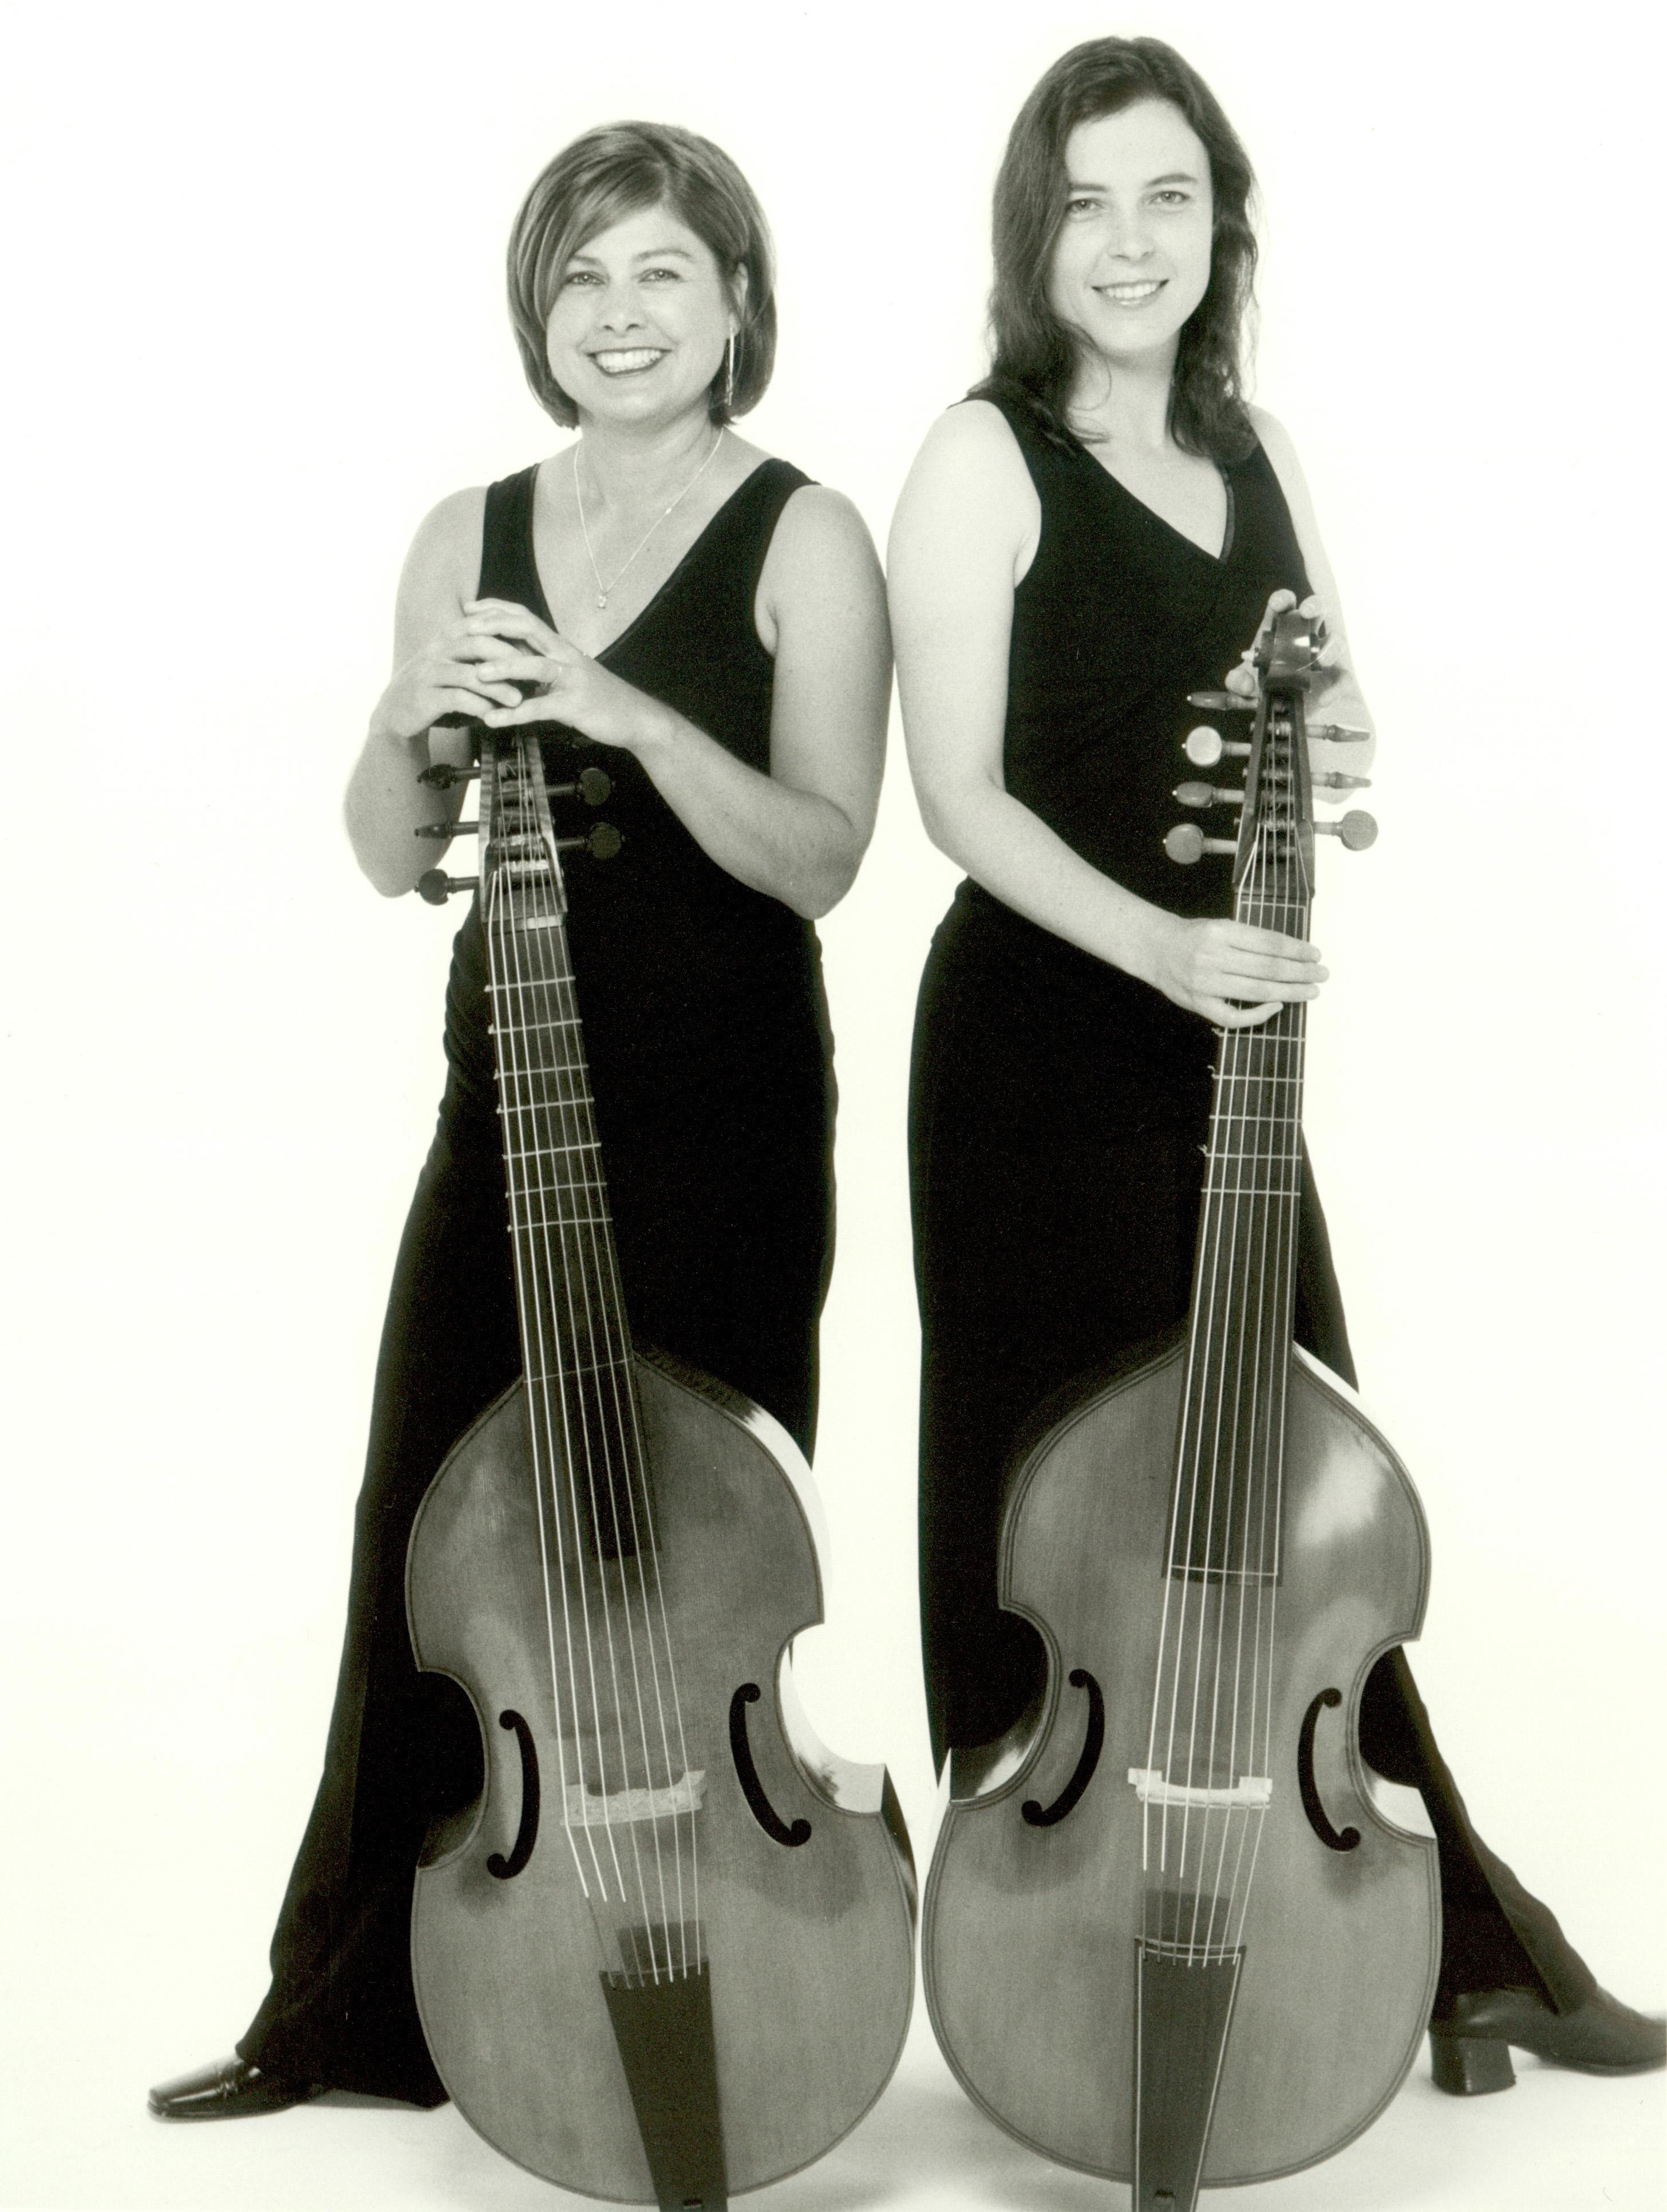 Jennifer Eriksson and Cathy Upex